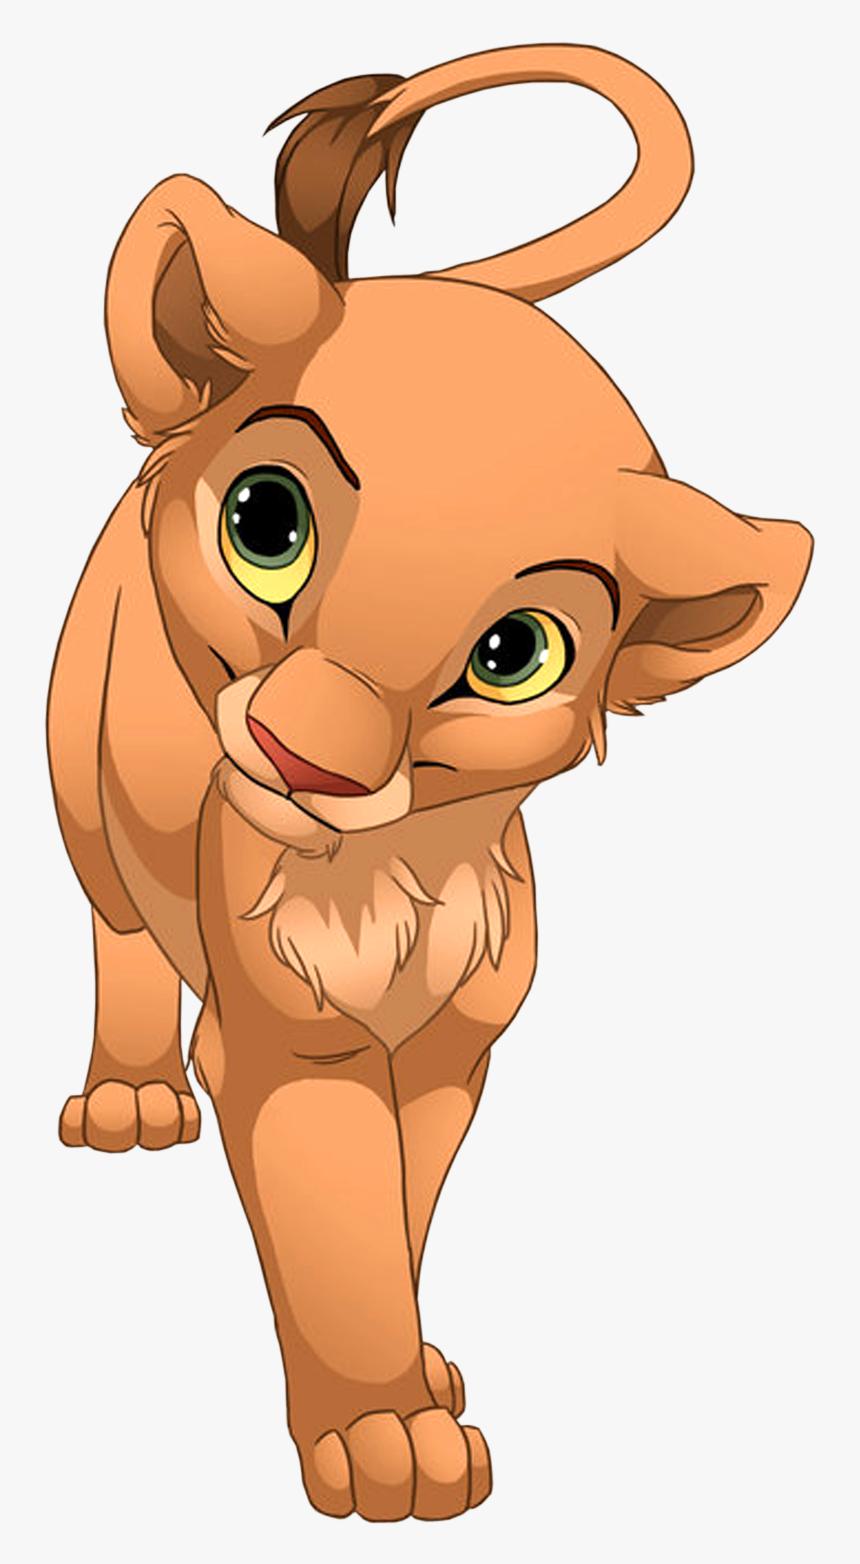 Simba And Nala Love, HD Png Download, Free Download